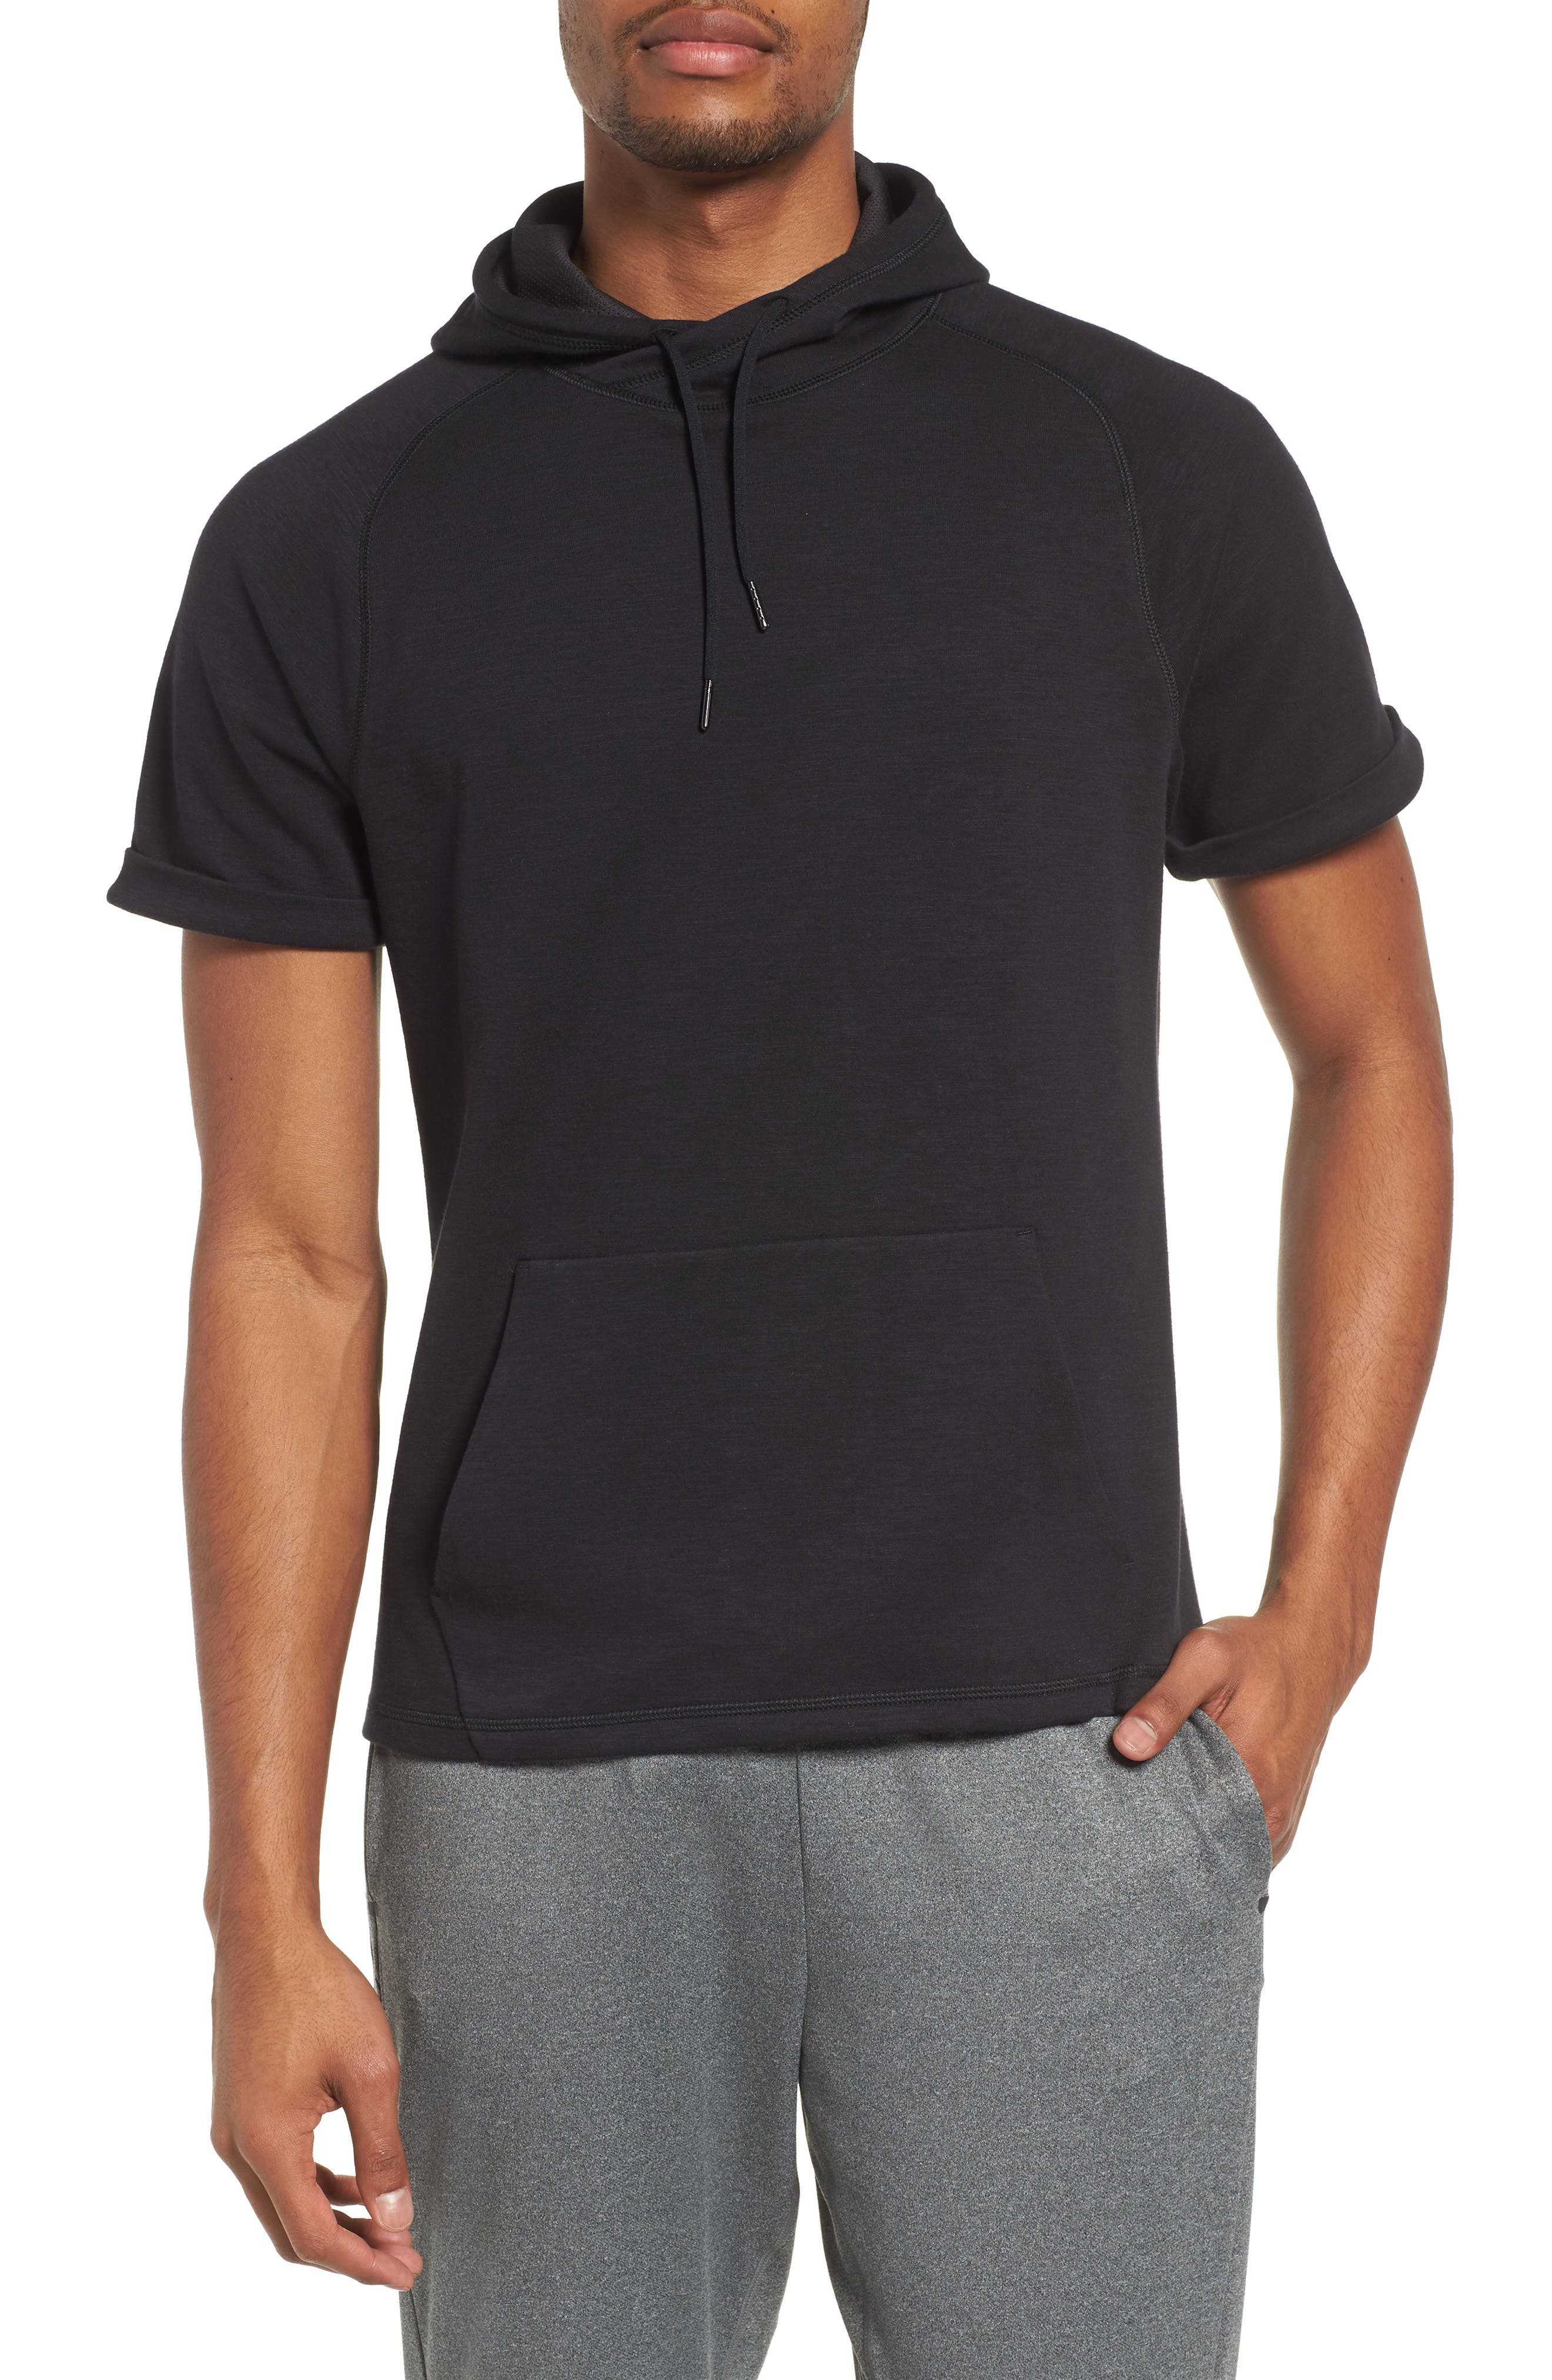 Magnetite Short Sleeve Cotton Blend Hoodie,                             Main thumbnail 1, color,                             Black Oxide Melange